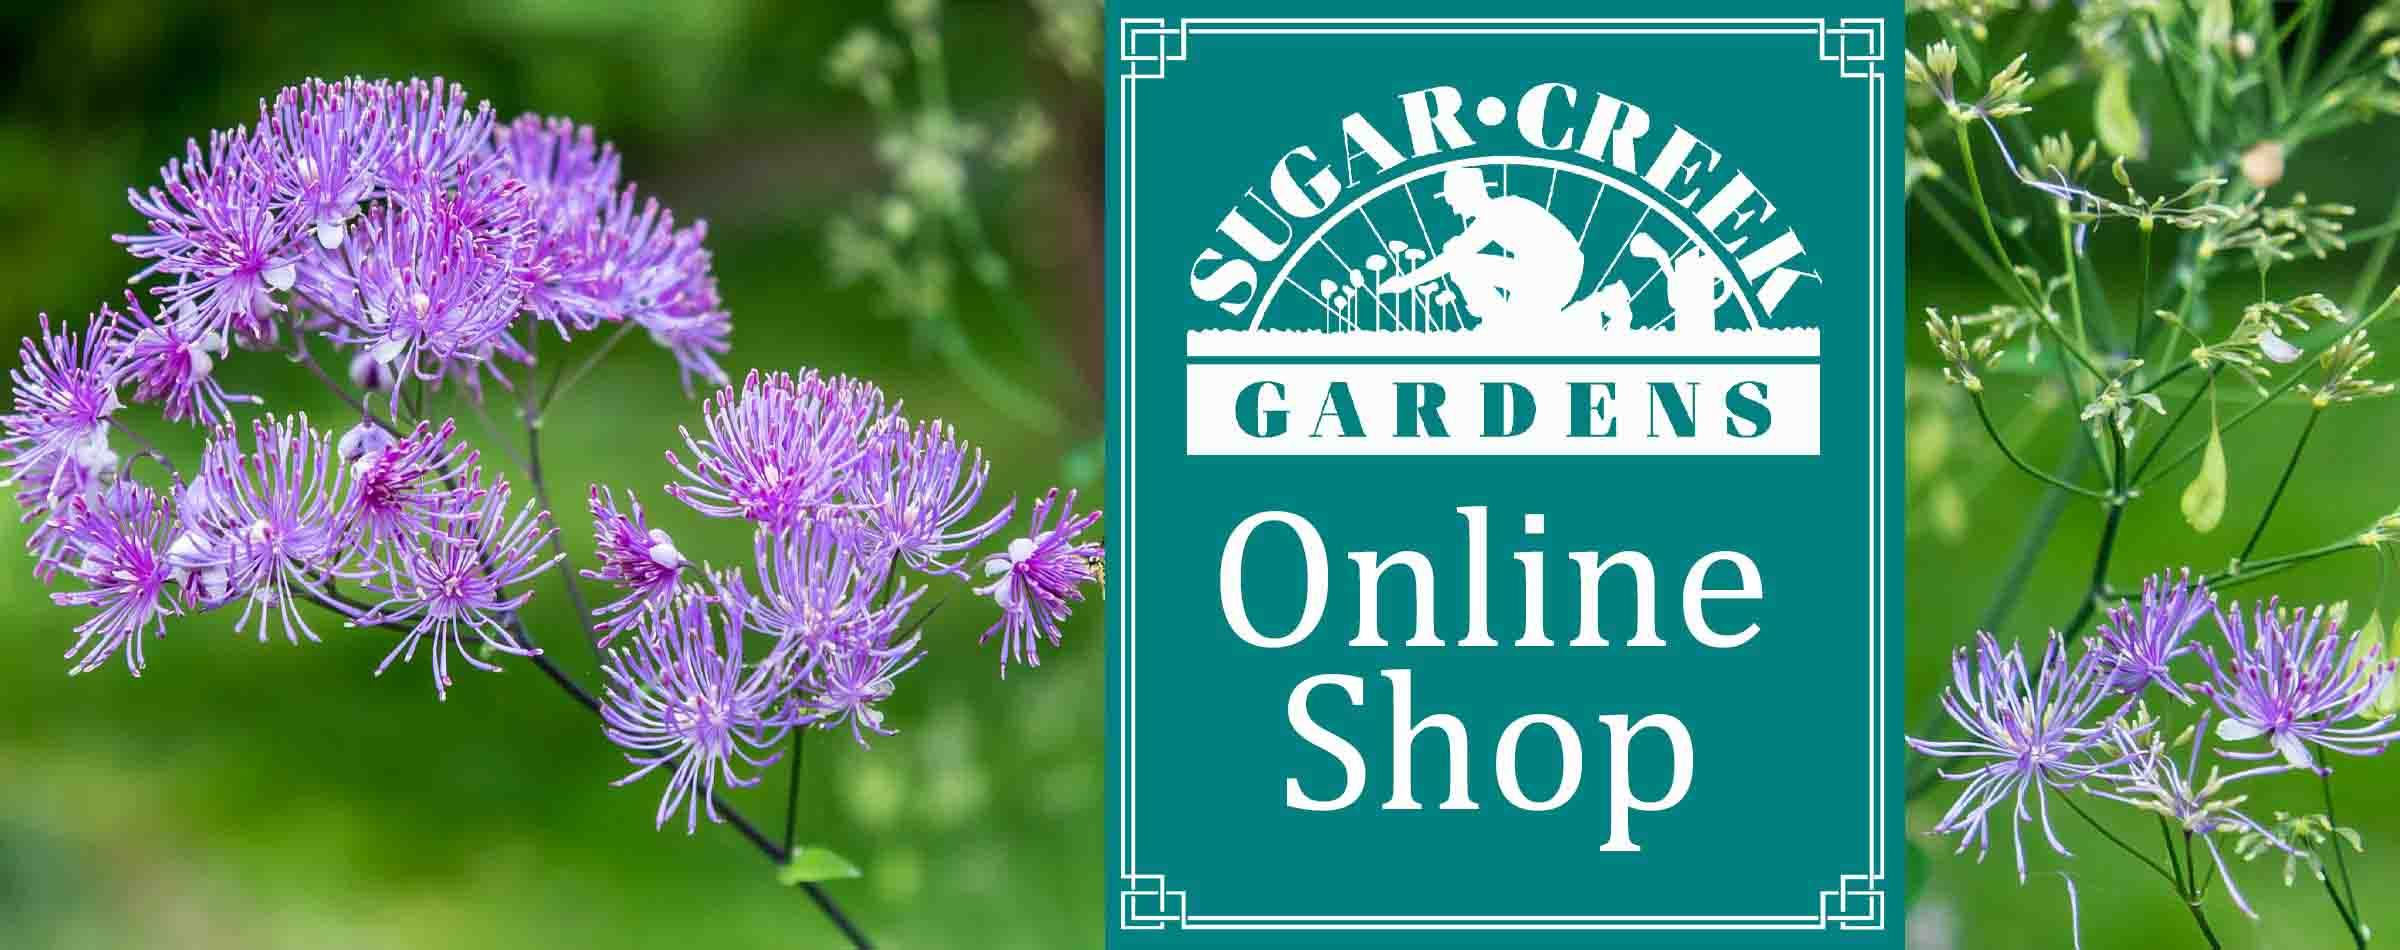 Sugar Creek Gardens online shop